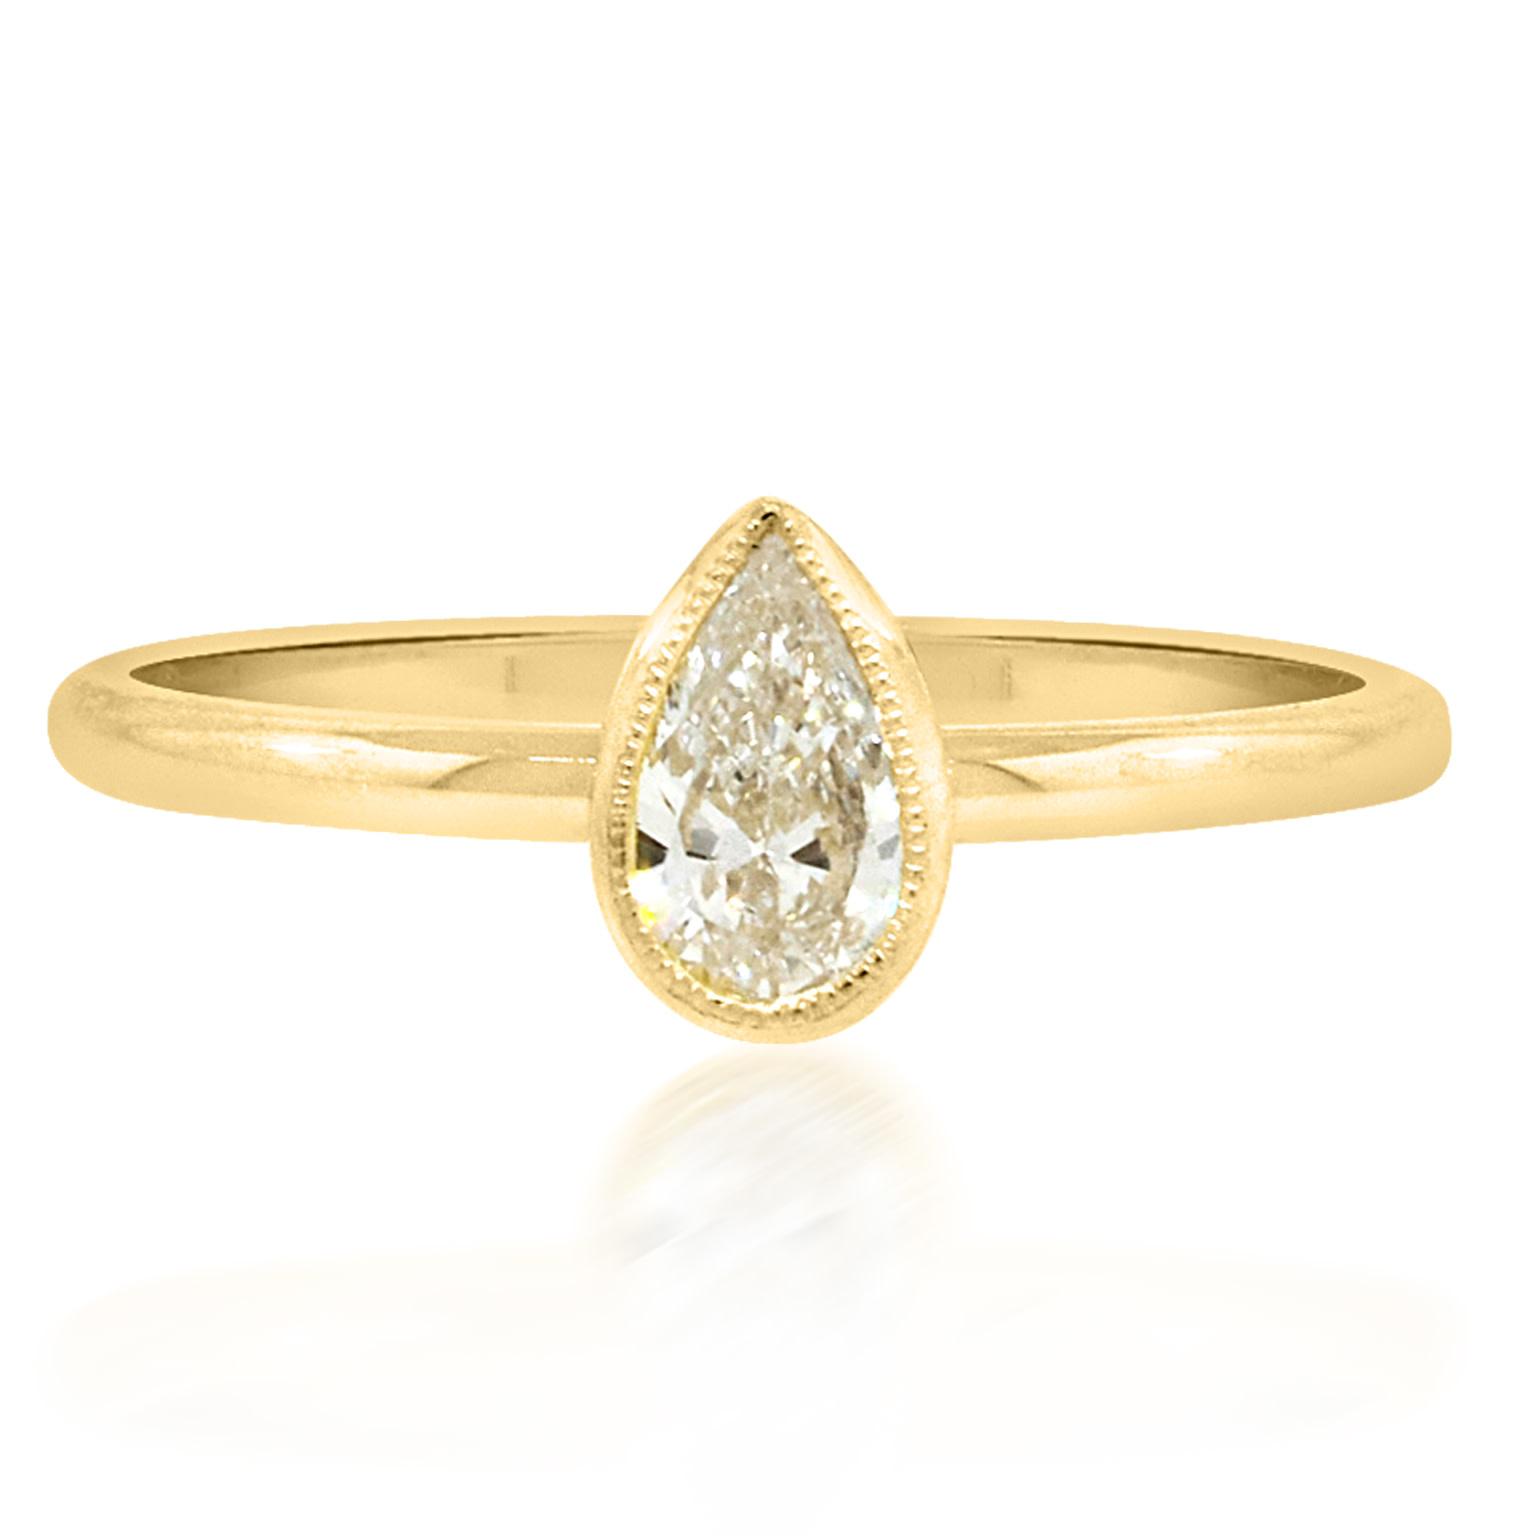 Trabert Goldsmiths Pear Diamond Yellow Gold Ring